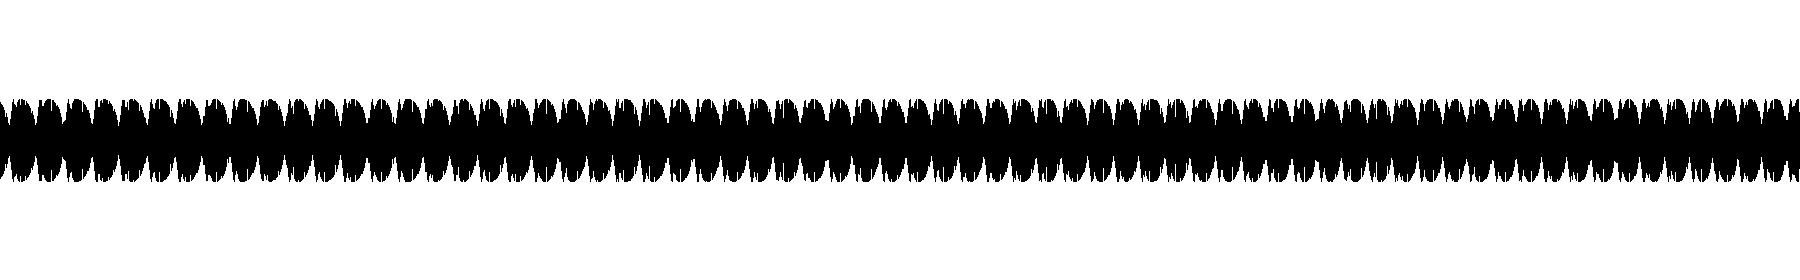 1 003